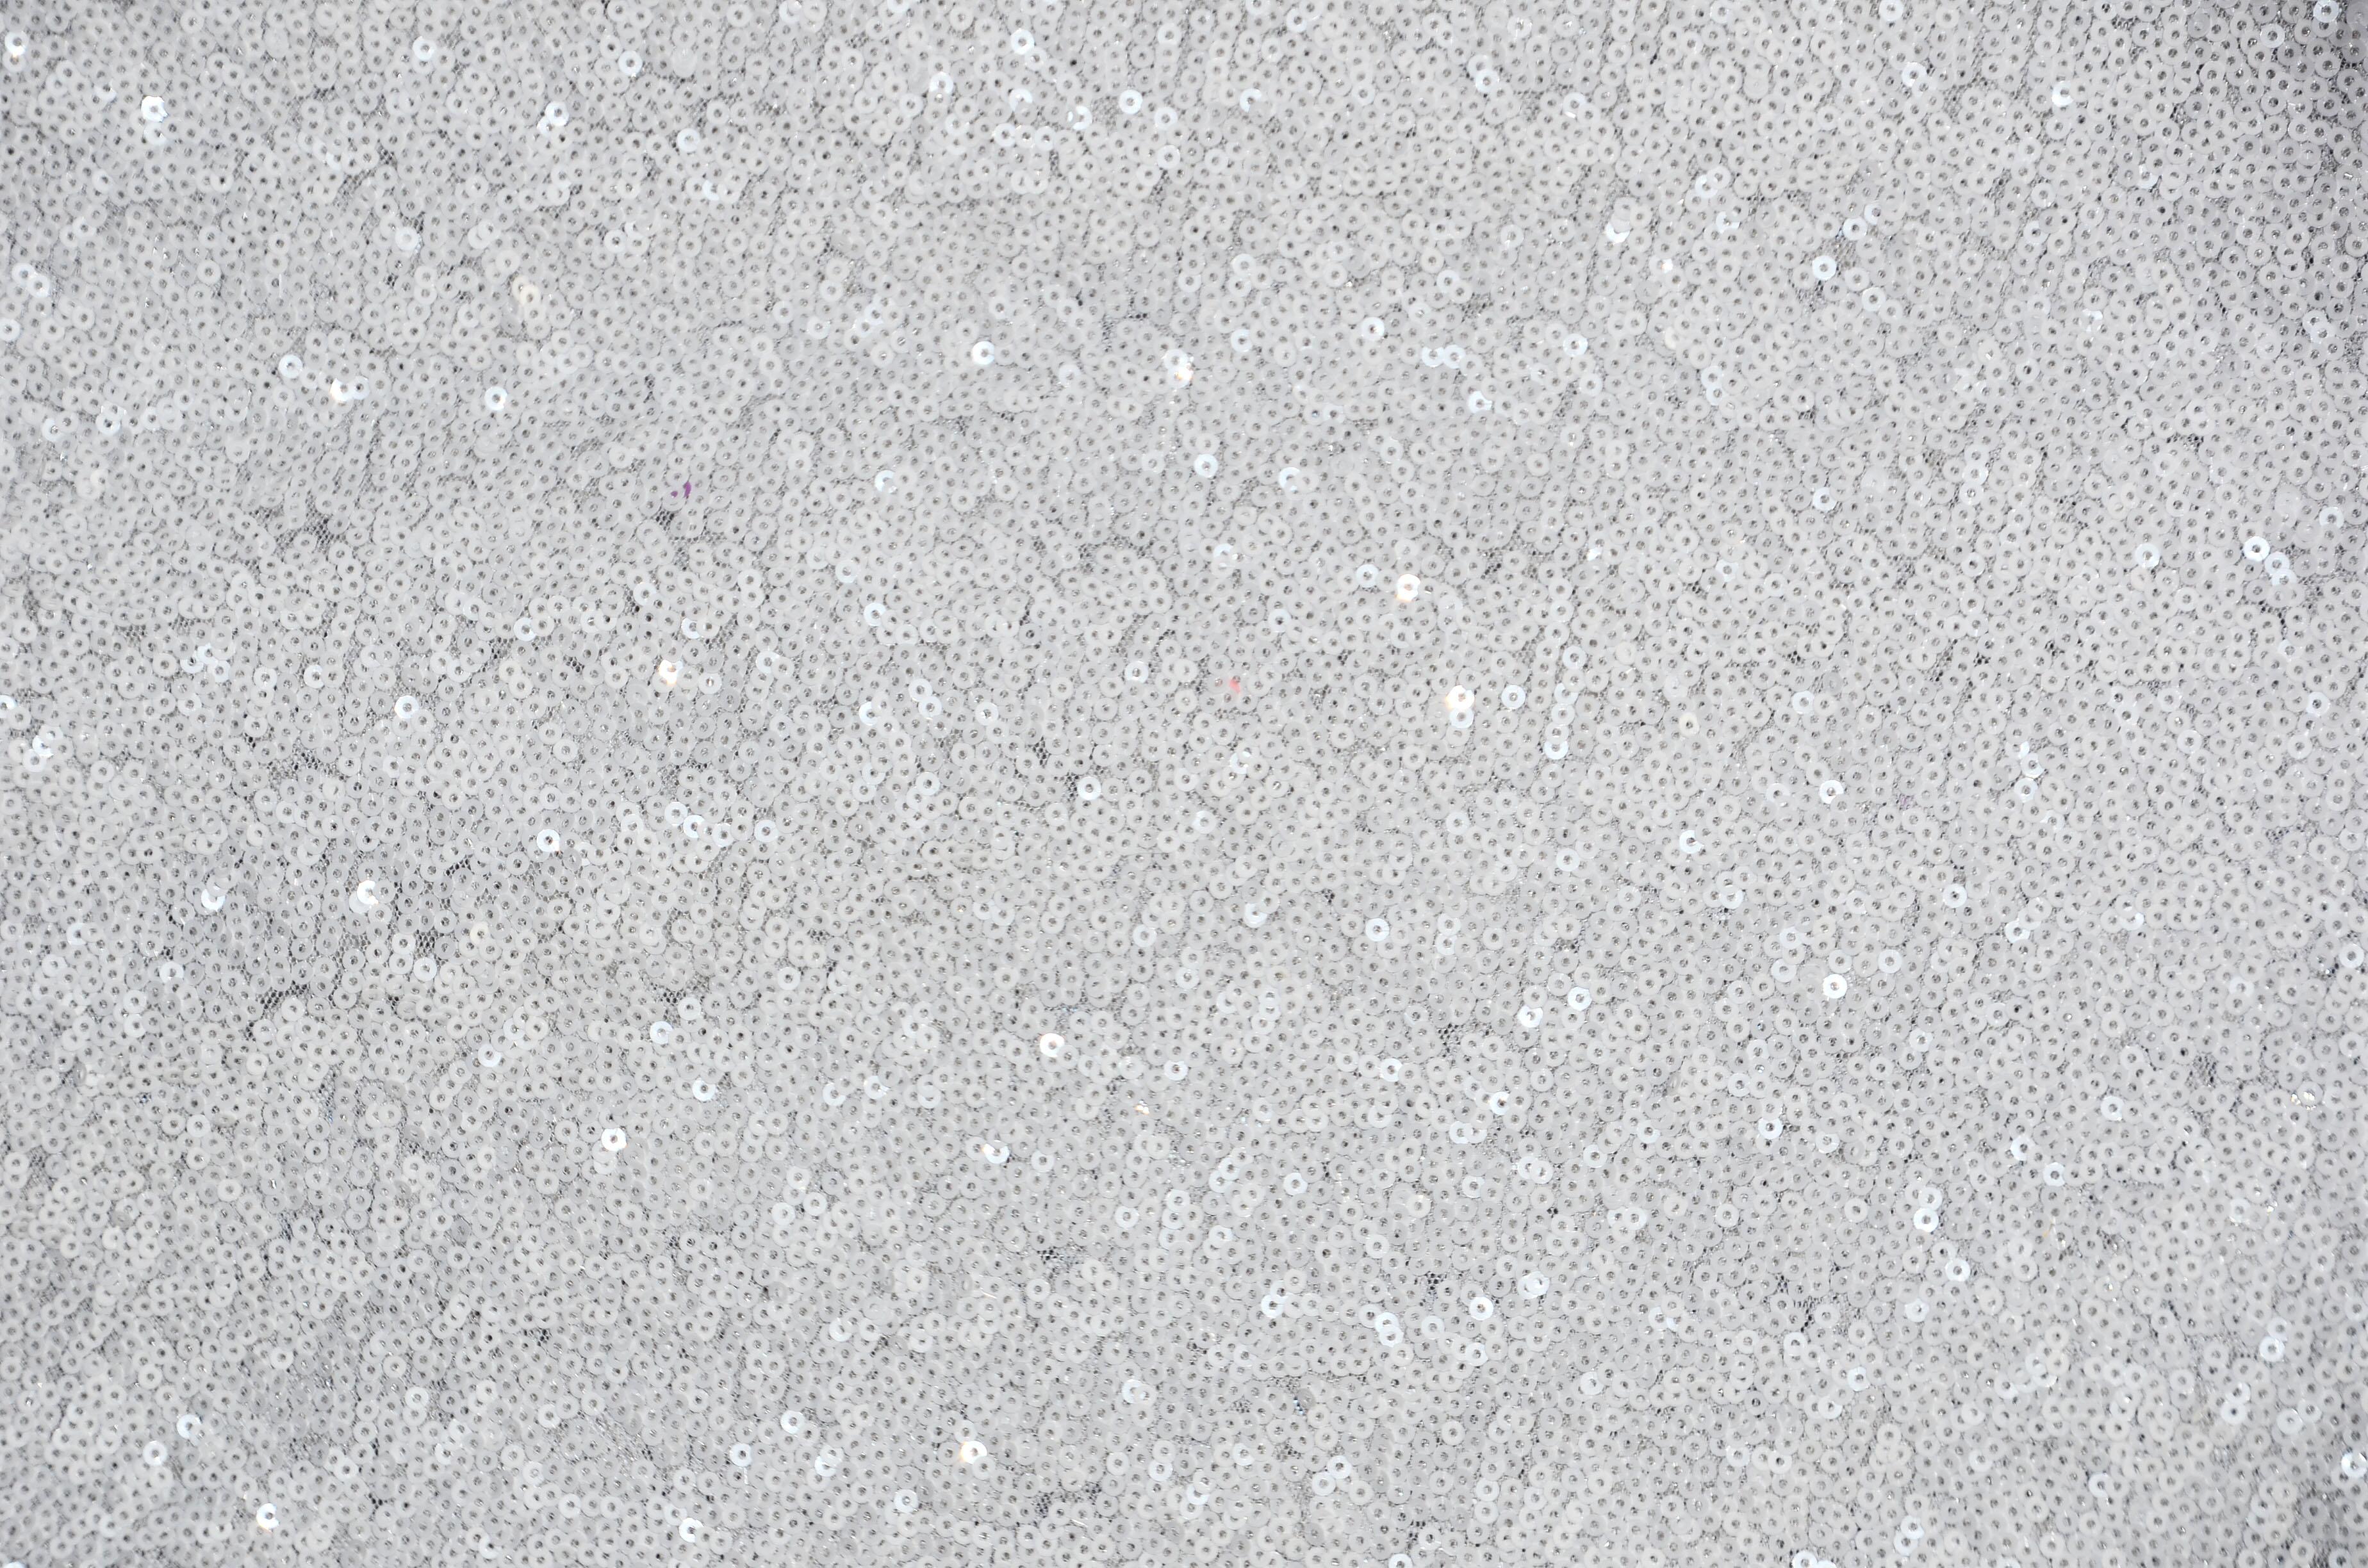 White Sparkle Wallpaper Wallpapersafari